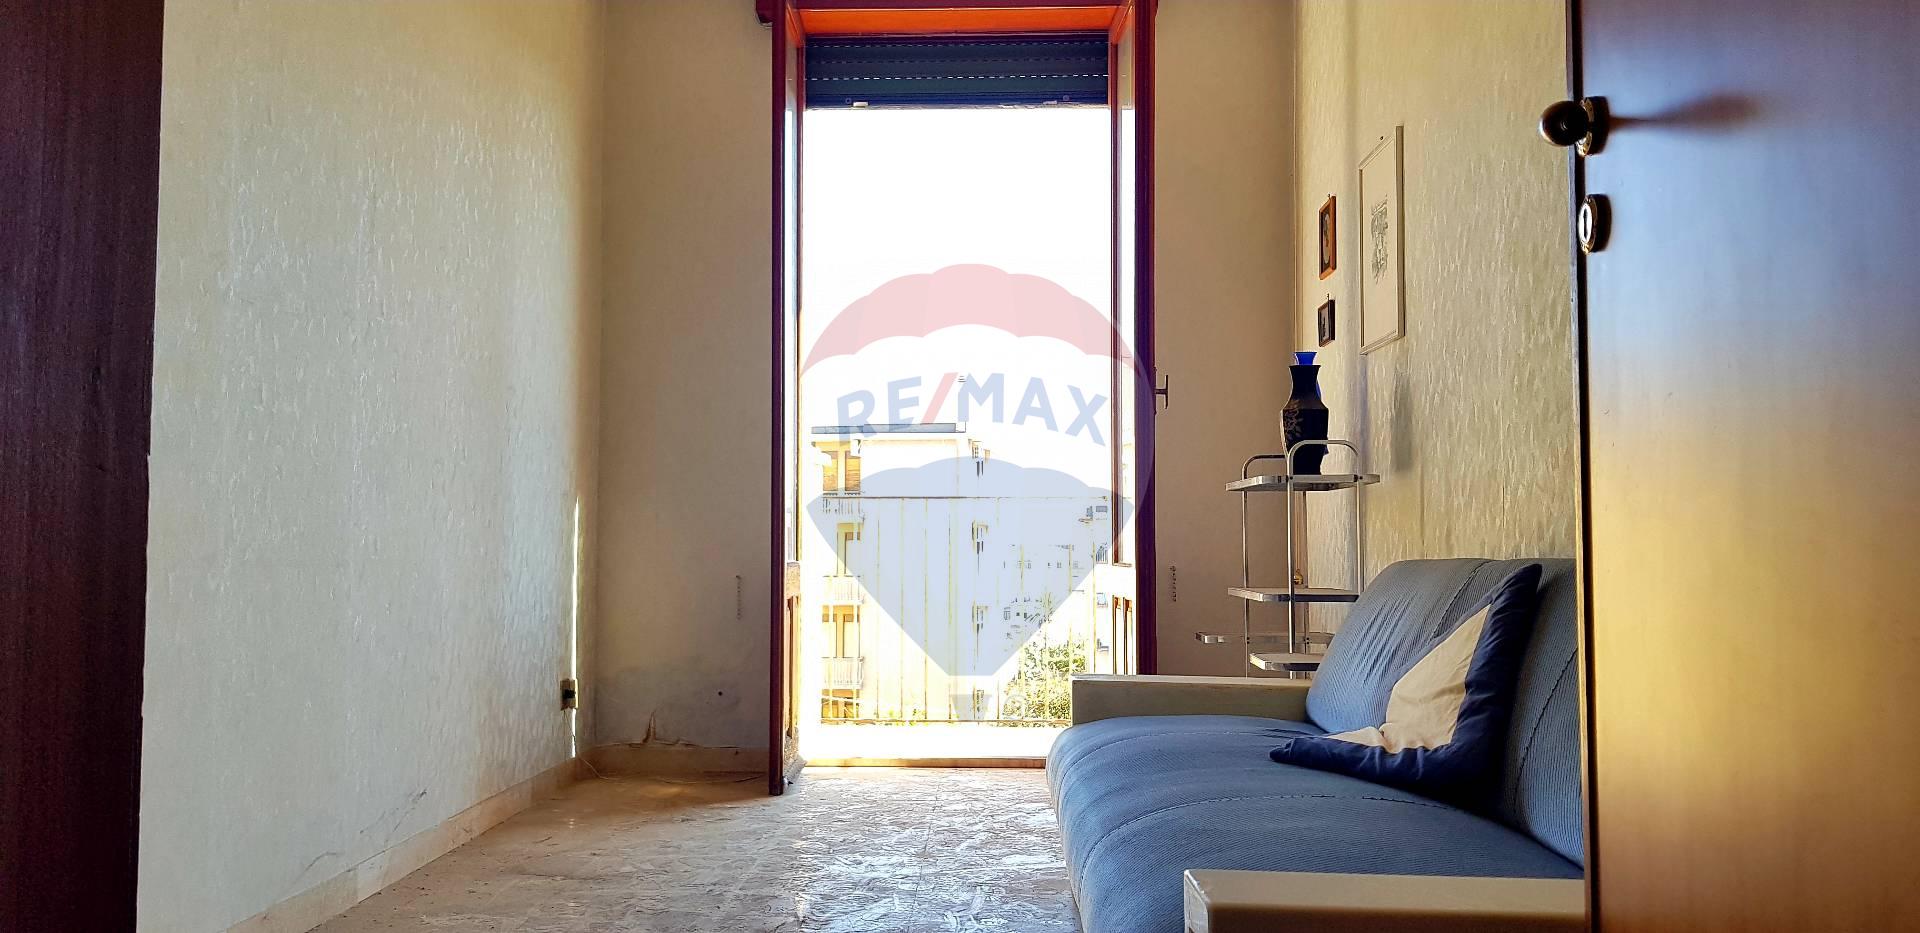 catania vendita quart: catania-canalicchio,tivoli re/max casa trend